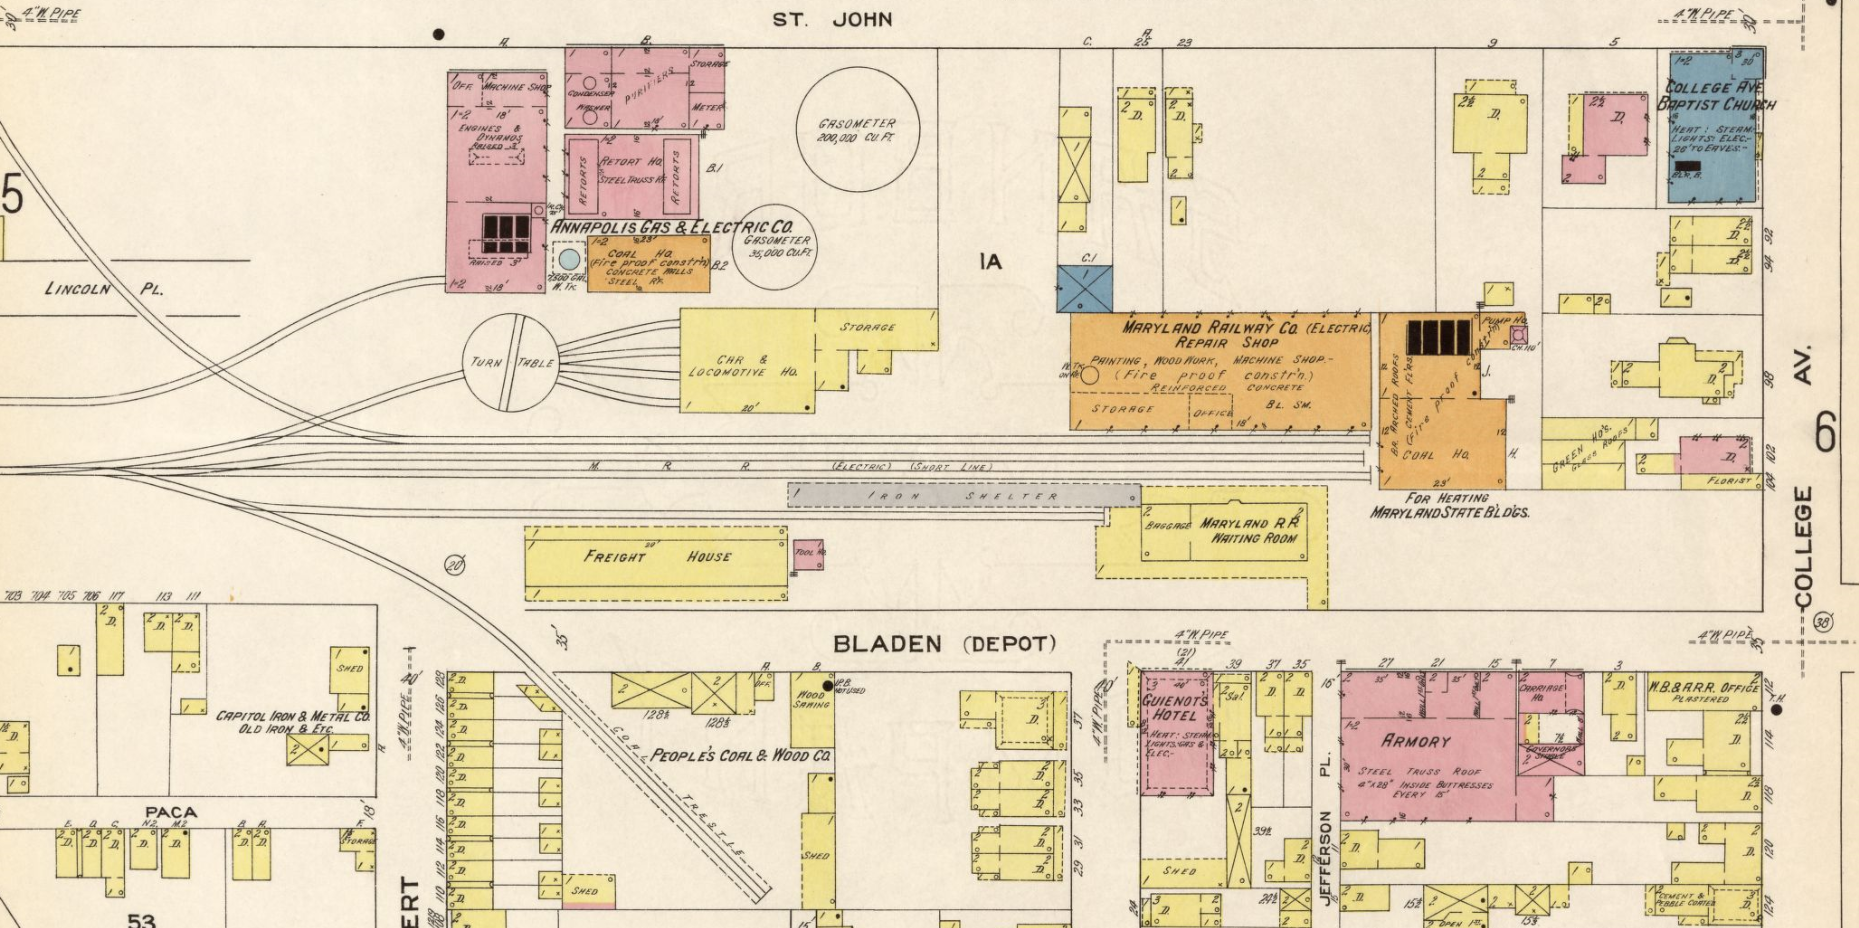 Baltimore & Annapolis Railroad, Bladen Street Station. Annapolis, Maryland Date: 1913. Source: Sanborn Fire Insurance Maps.